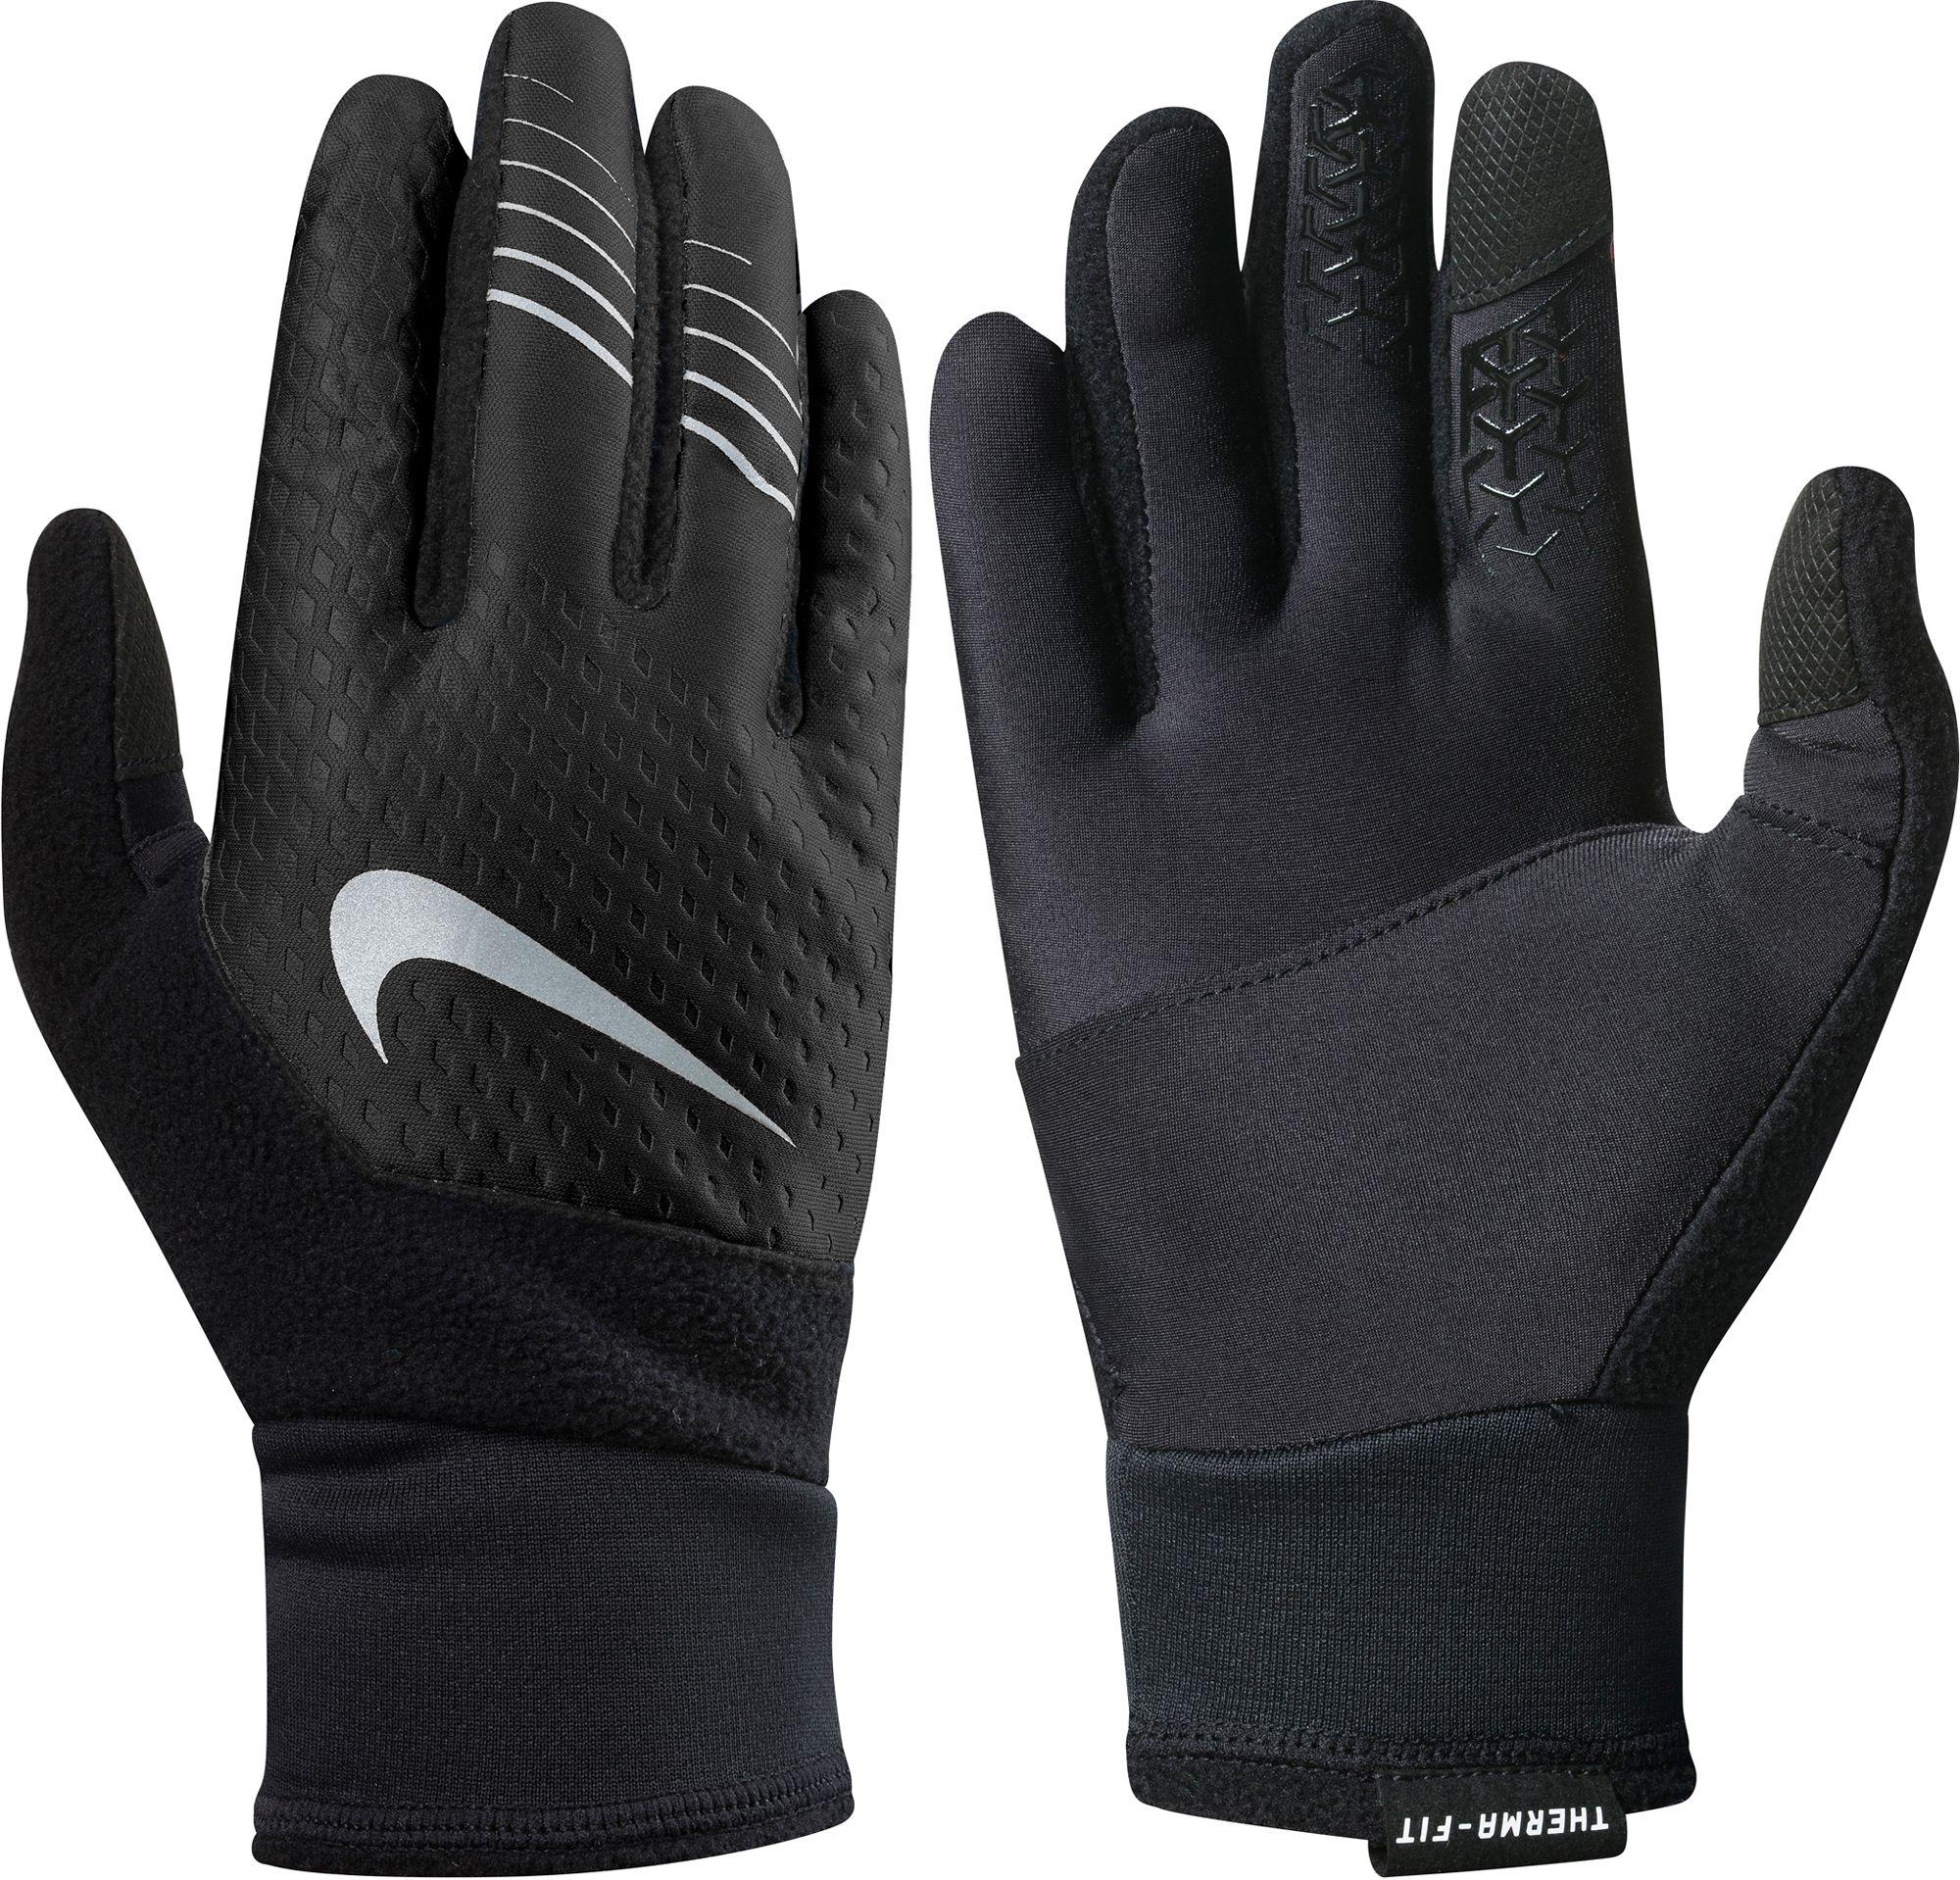 Driving gloves portland oregon - Product Image Nike Men S Therma Fit Elite Run Gloves 2 0